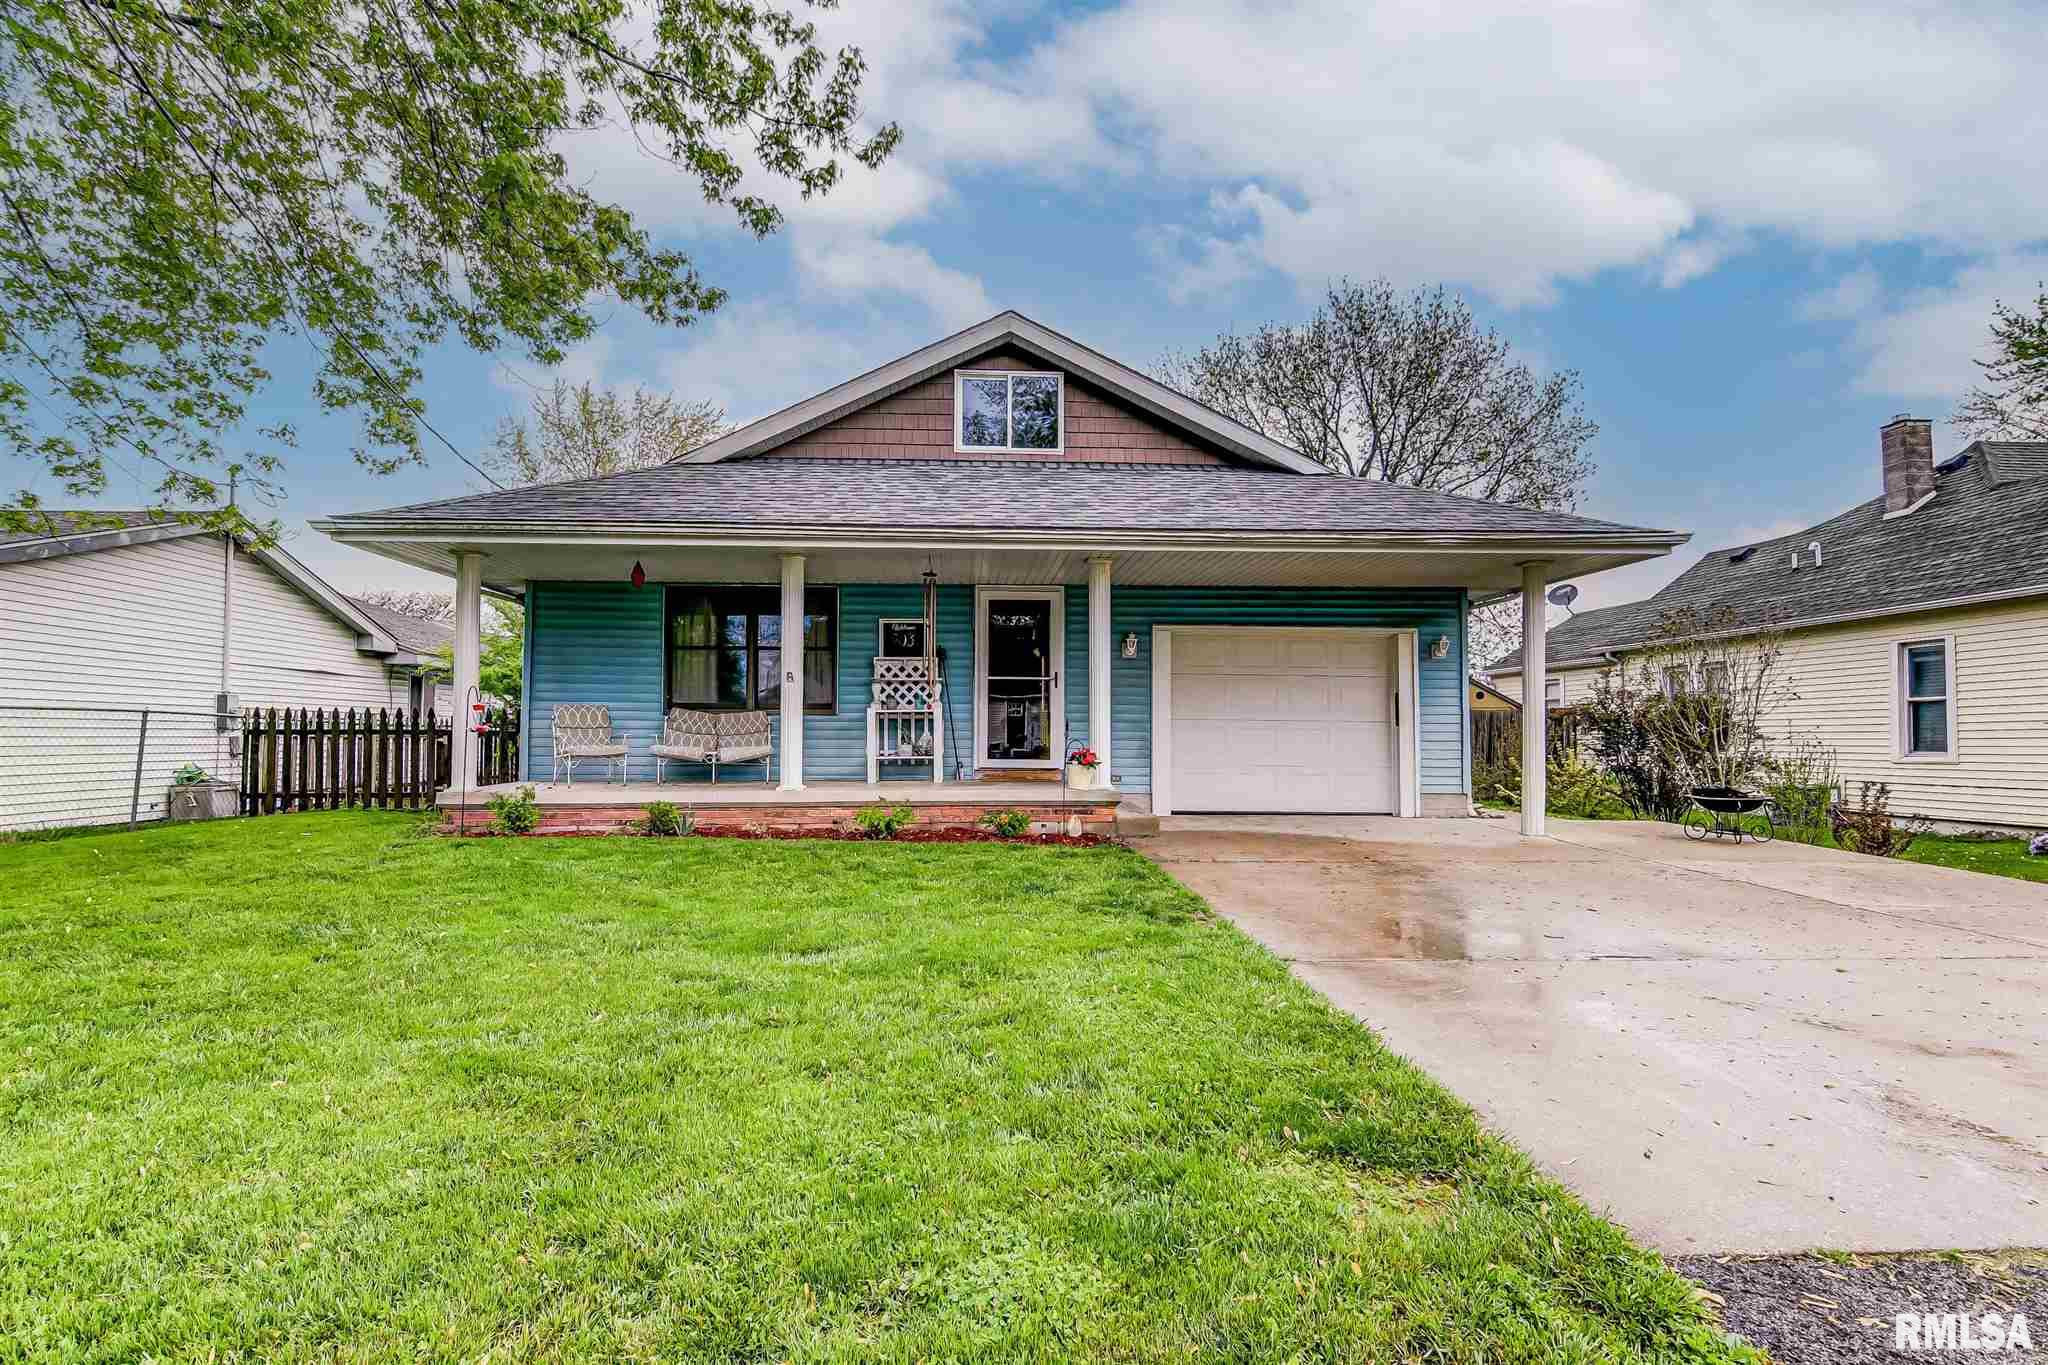 903 FRANKLIN Property Photo - Pawnee, IL real estate listing